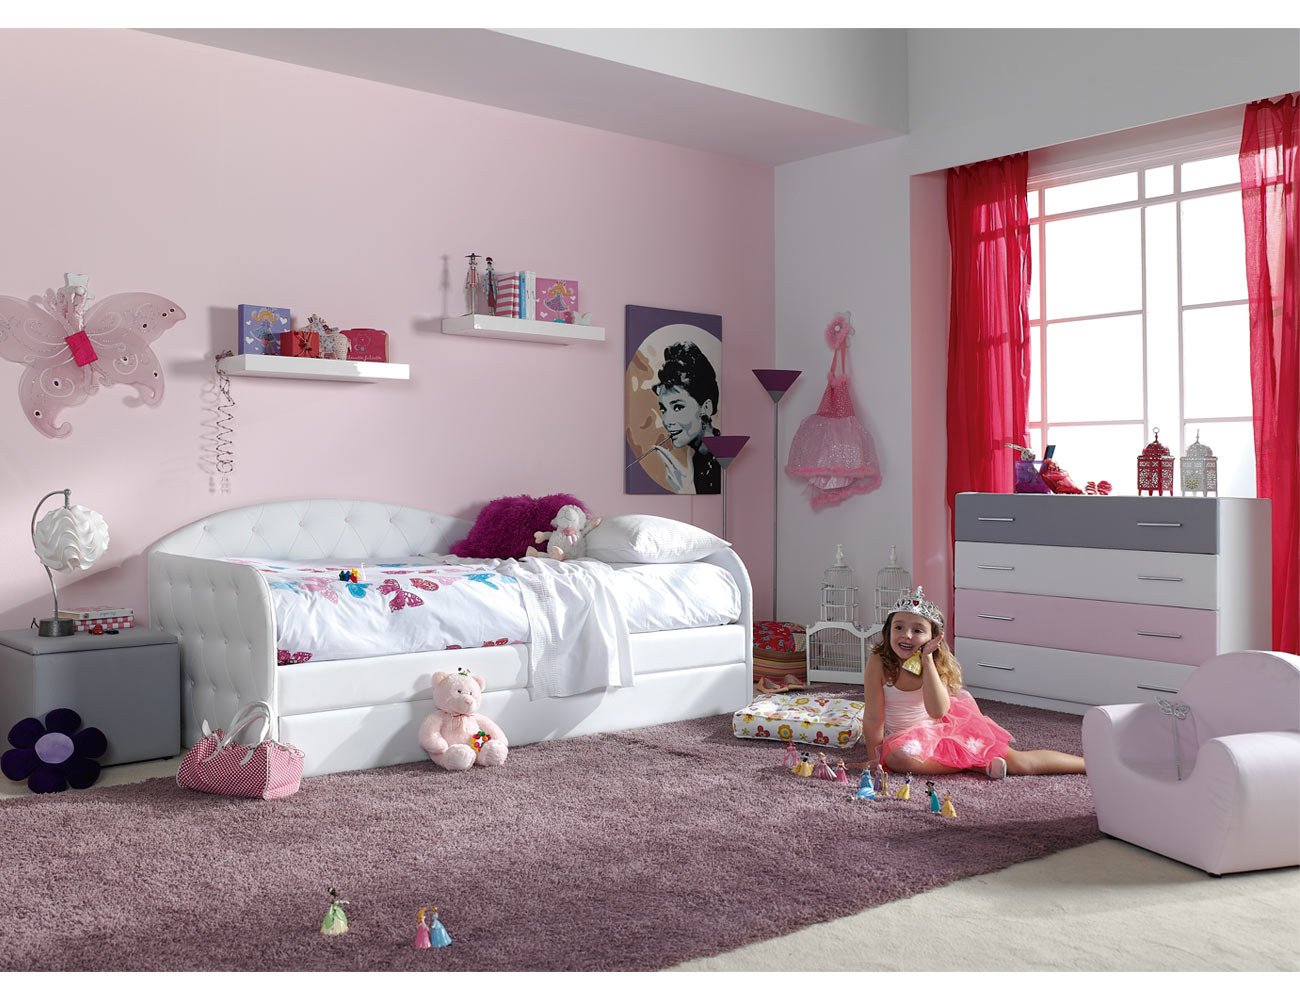 243 cama nido21